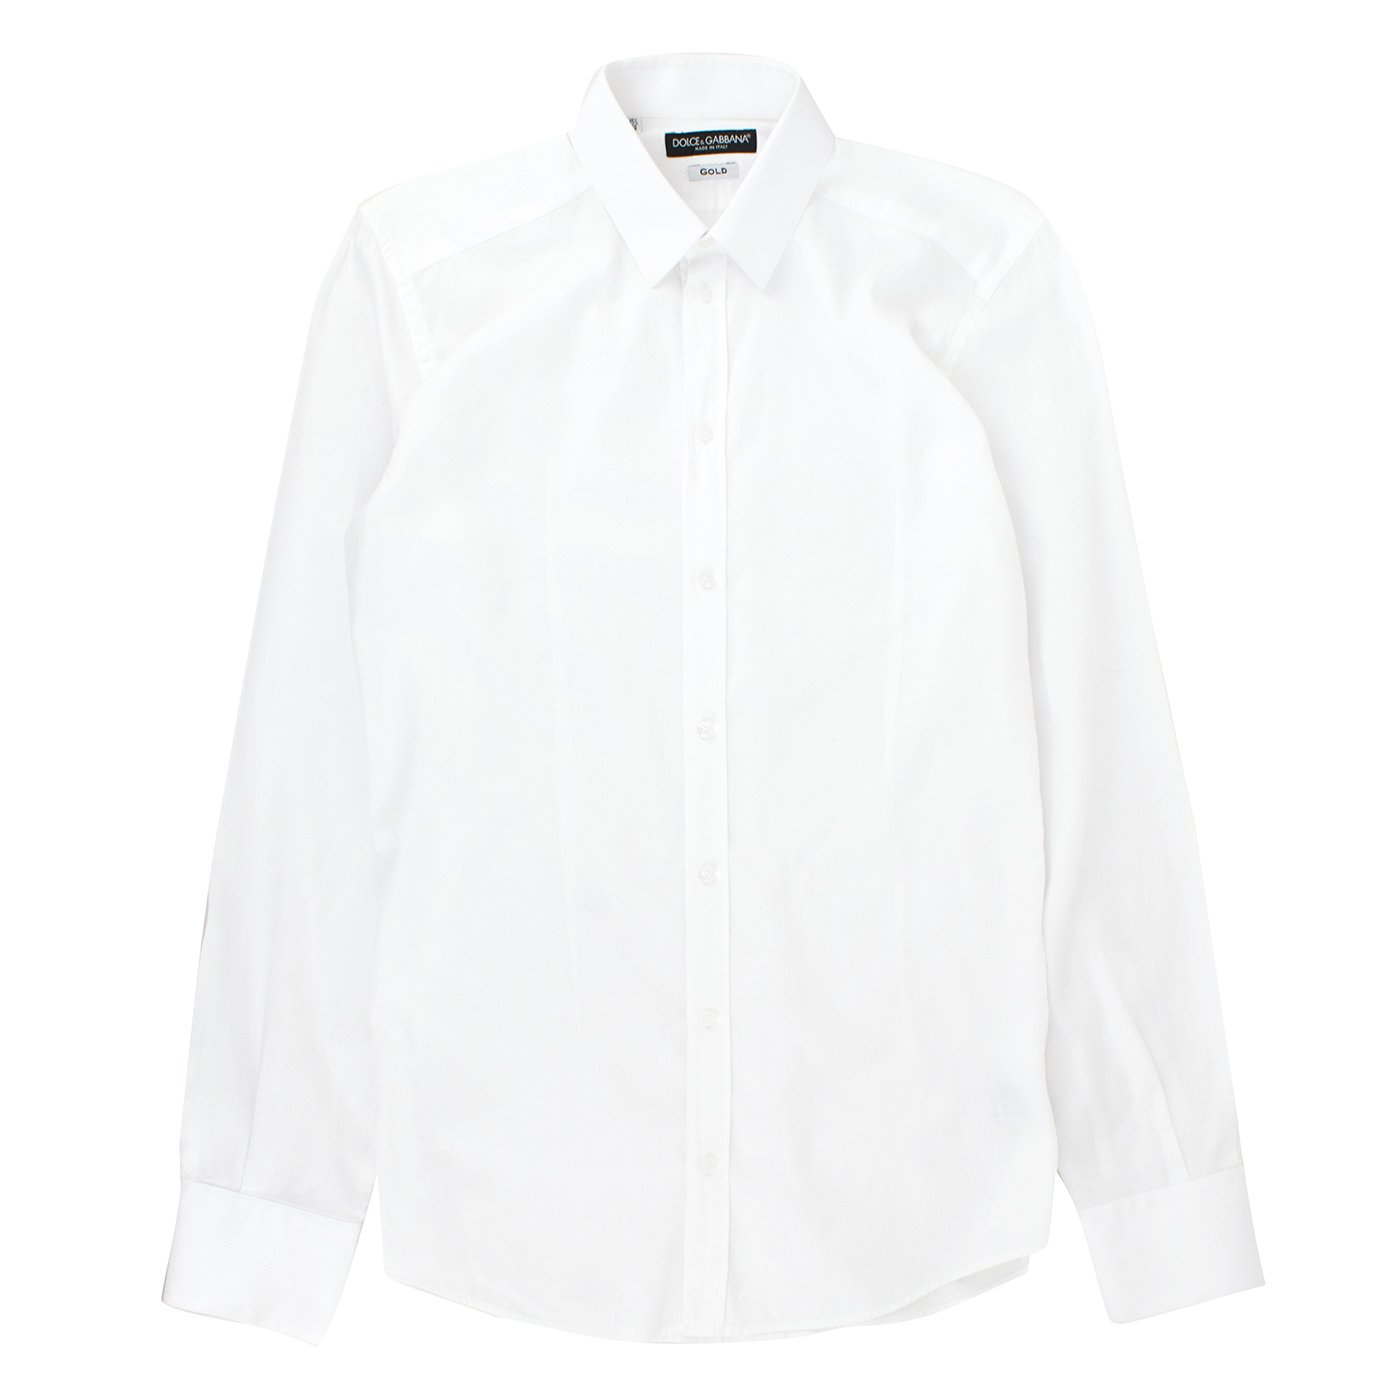 Dolce & Gabbana Gold-fit White Textured Shirt